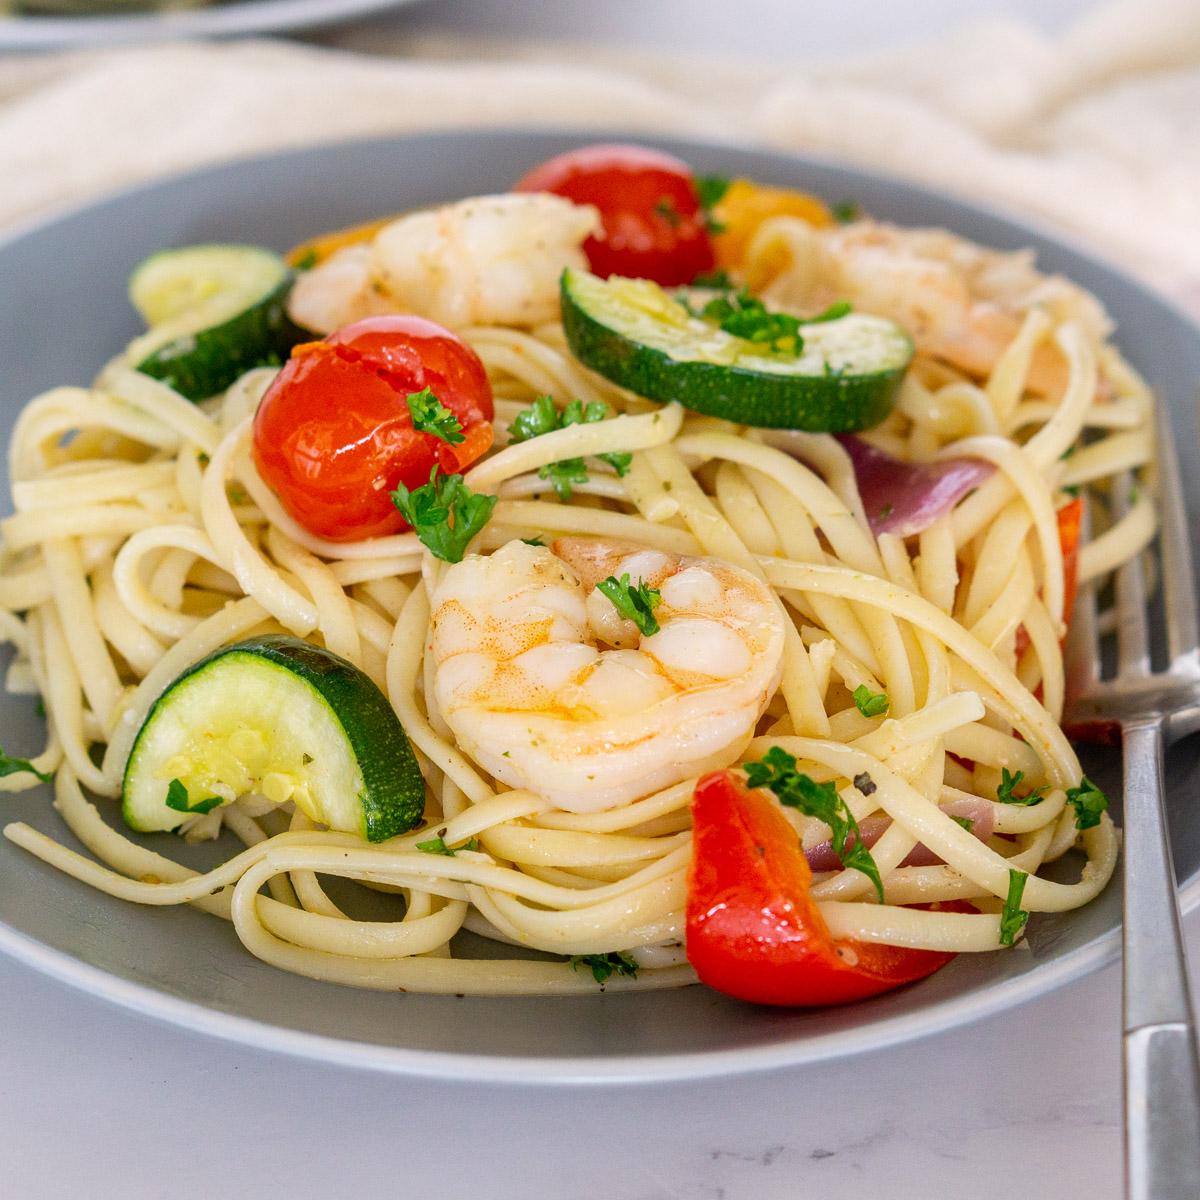 Sheet Pan Lemon Garlic Shrimp and Vegetable Linguine